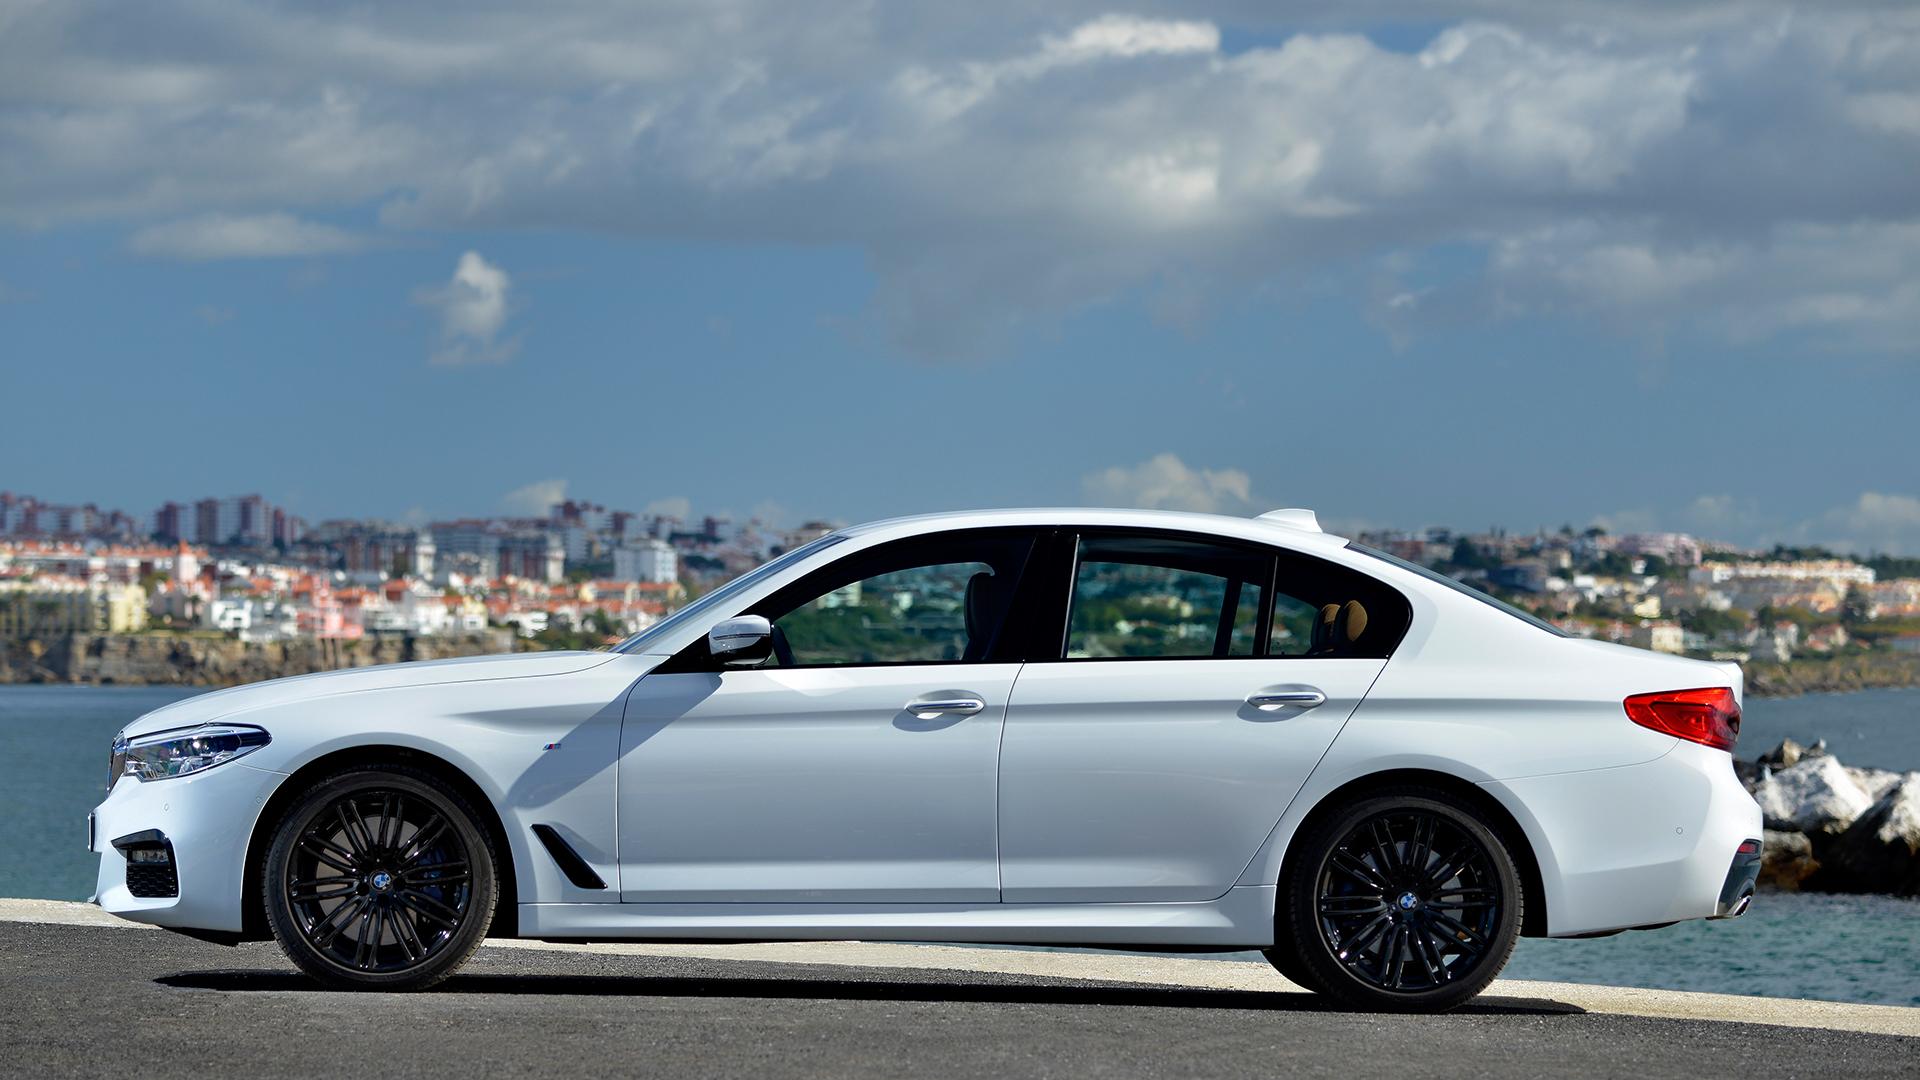 Bmw 5 Series 2019 520d Luxury Line Price Mileage Reviews